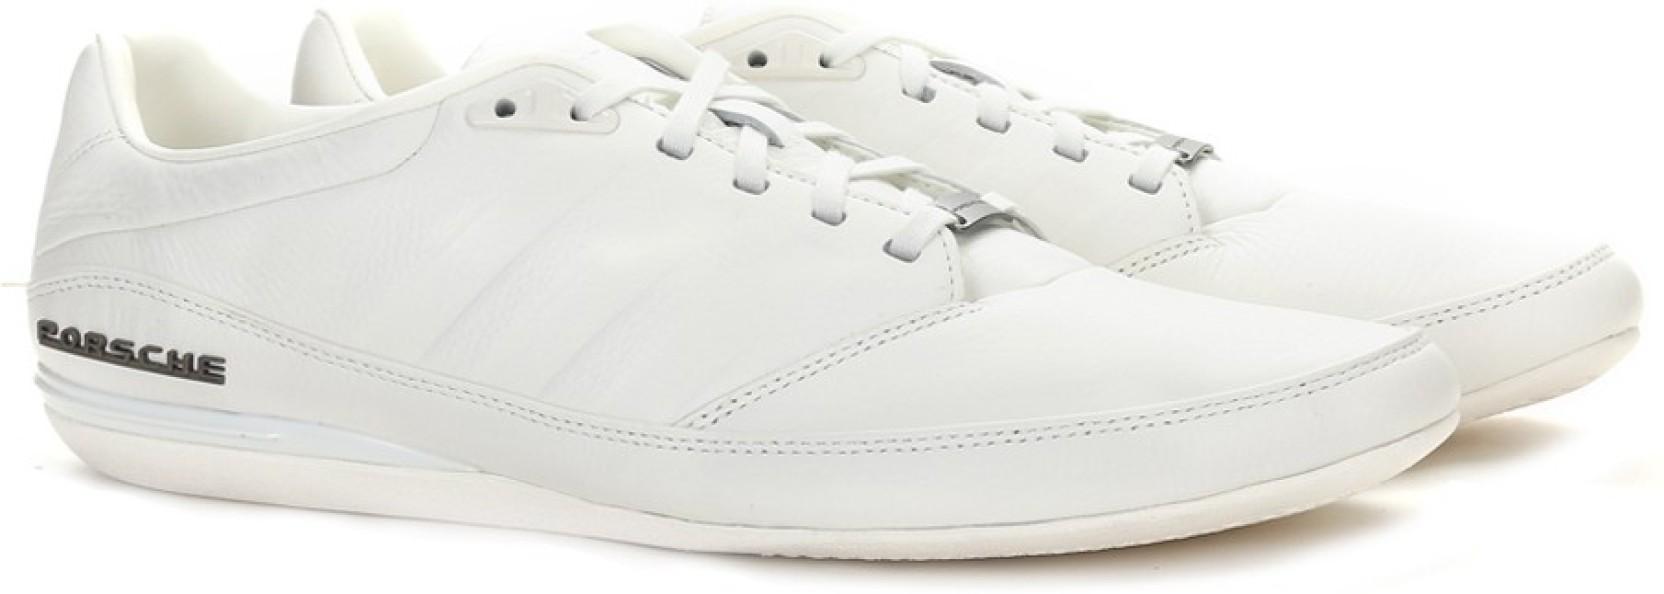 buy online c3cf9 9fcb1 canada adidas porsche design typ 64 price 6b399 dd982